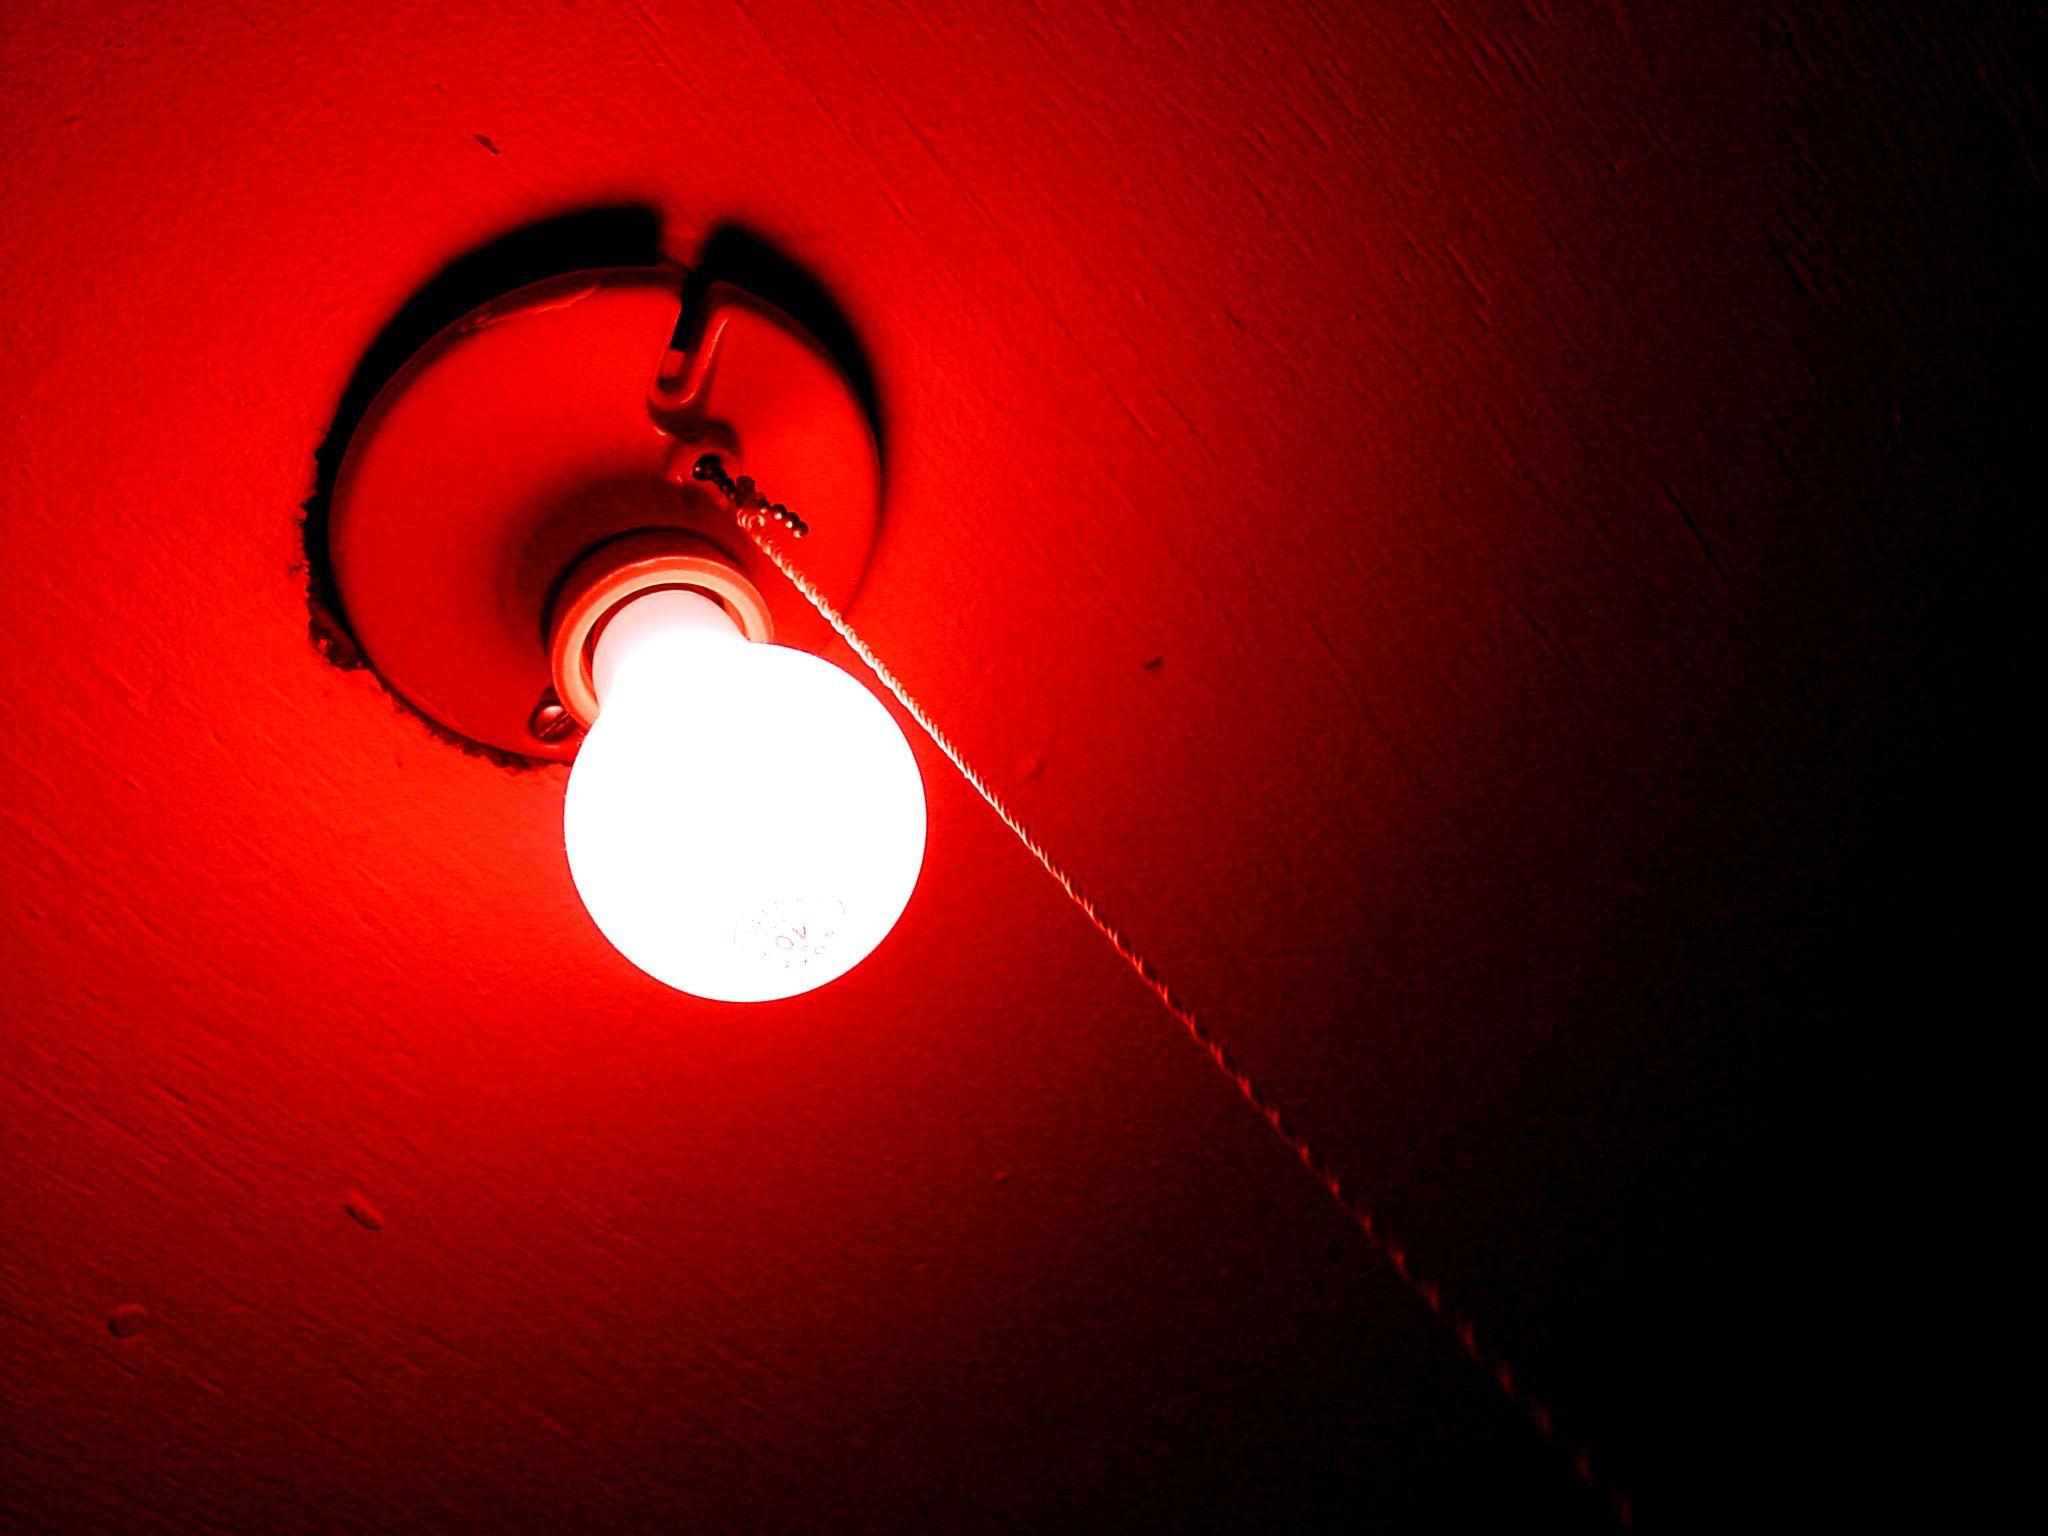 Dark room with light bulb - Red Light Bulbs Room Design Inspiration 911321 Light Of Lamp